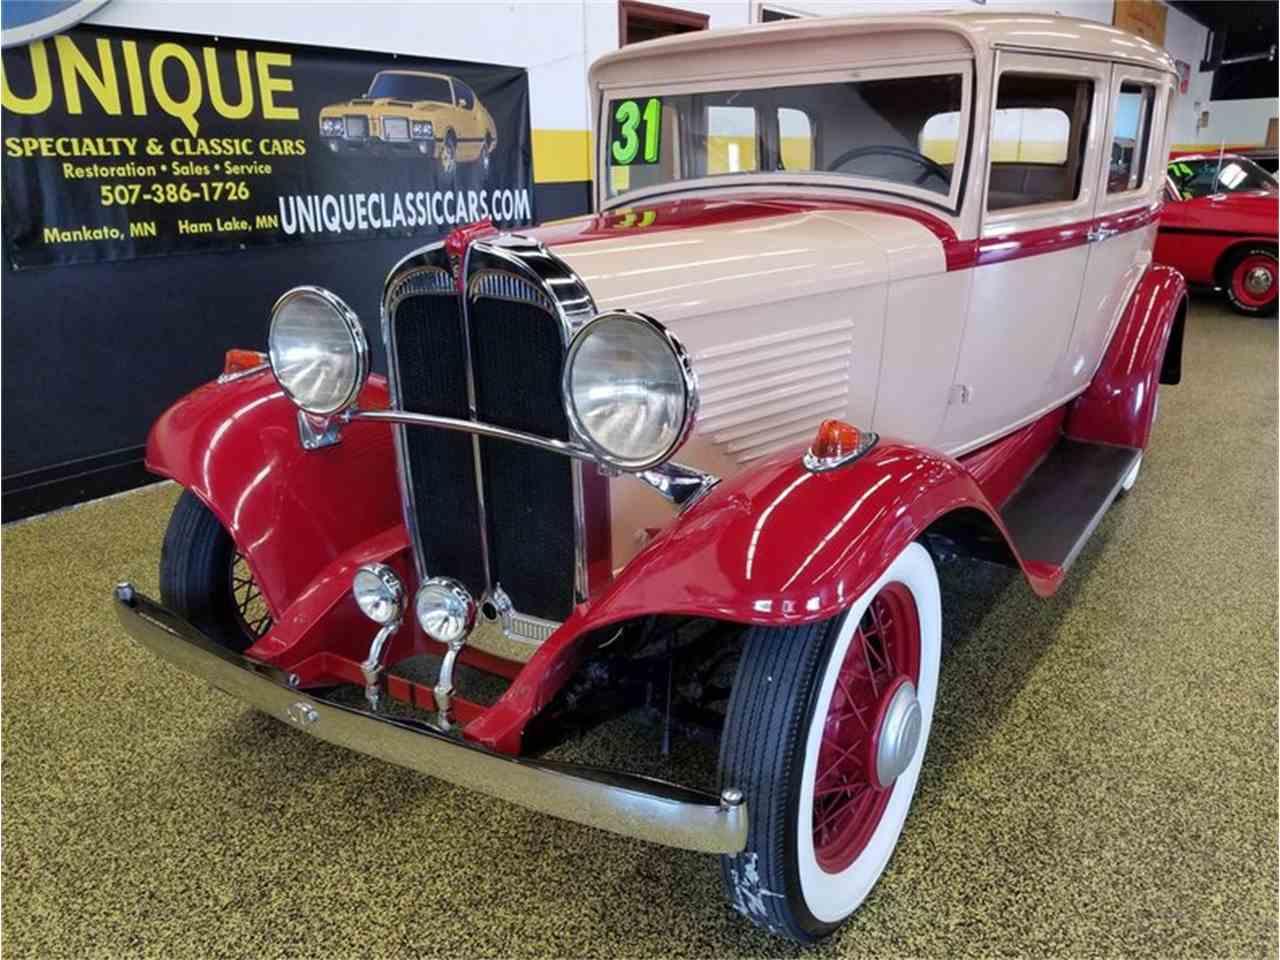 Amazing Classic Cars For Sales Photos - Classic Cars Ideas - boiq.info